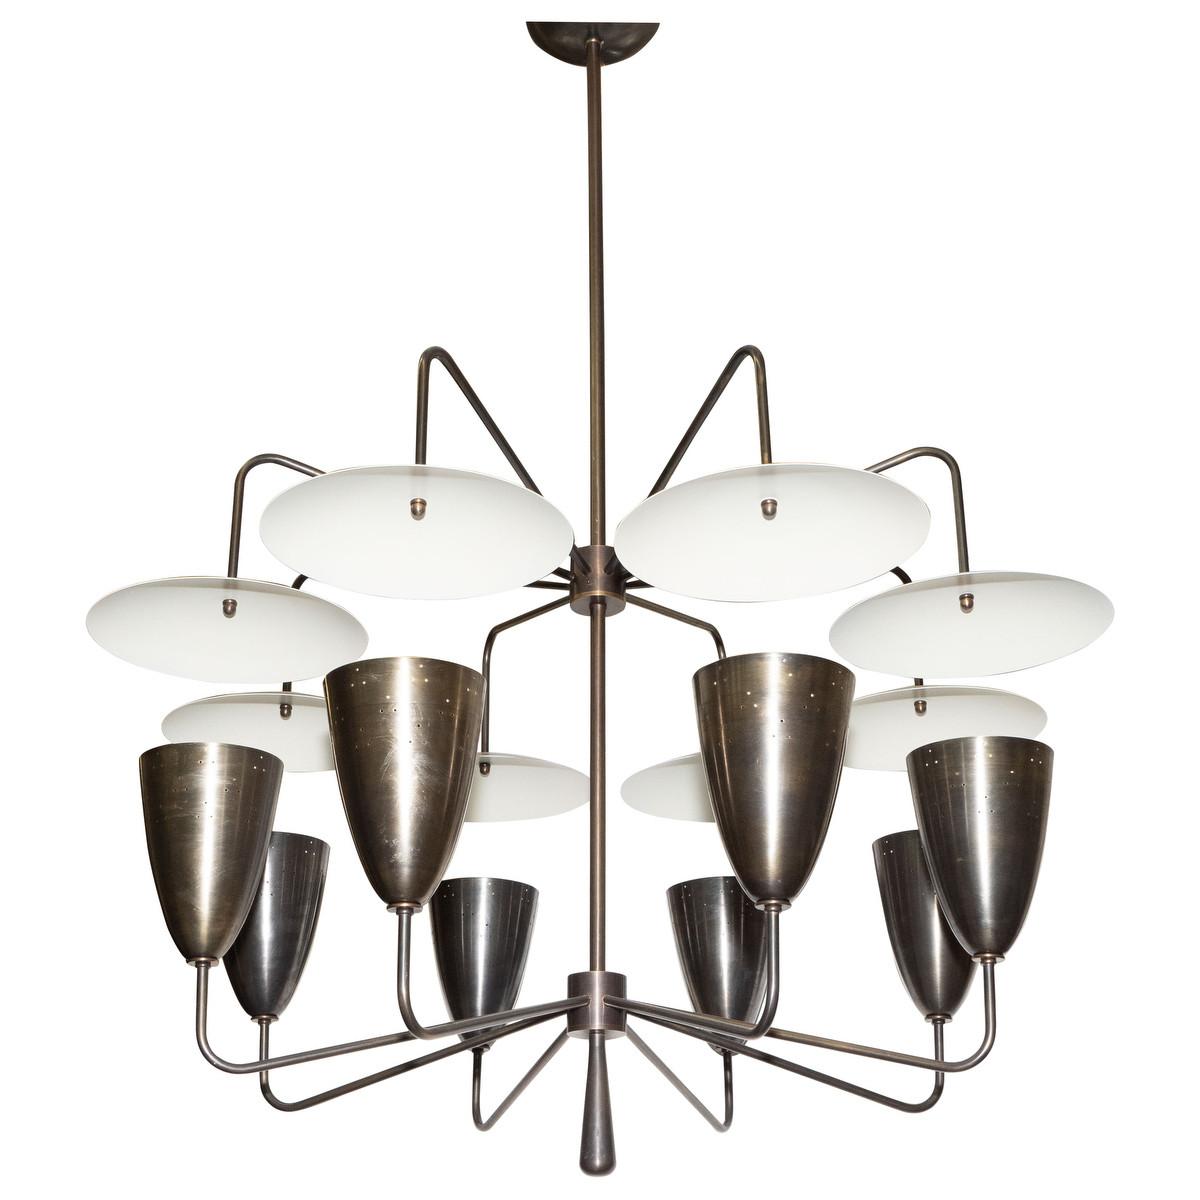 Reflector shade chandelier